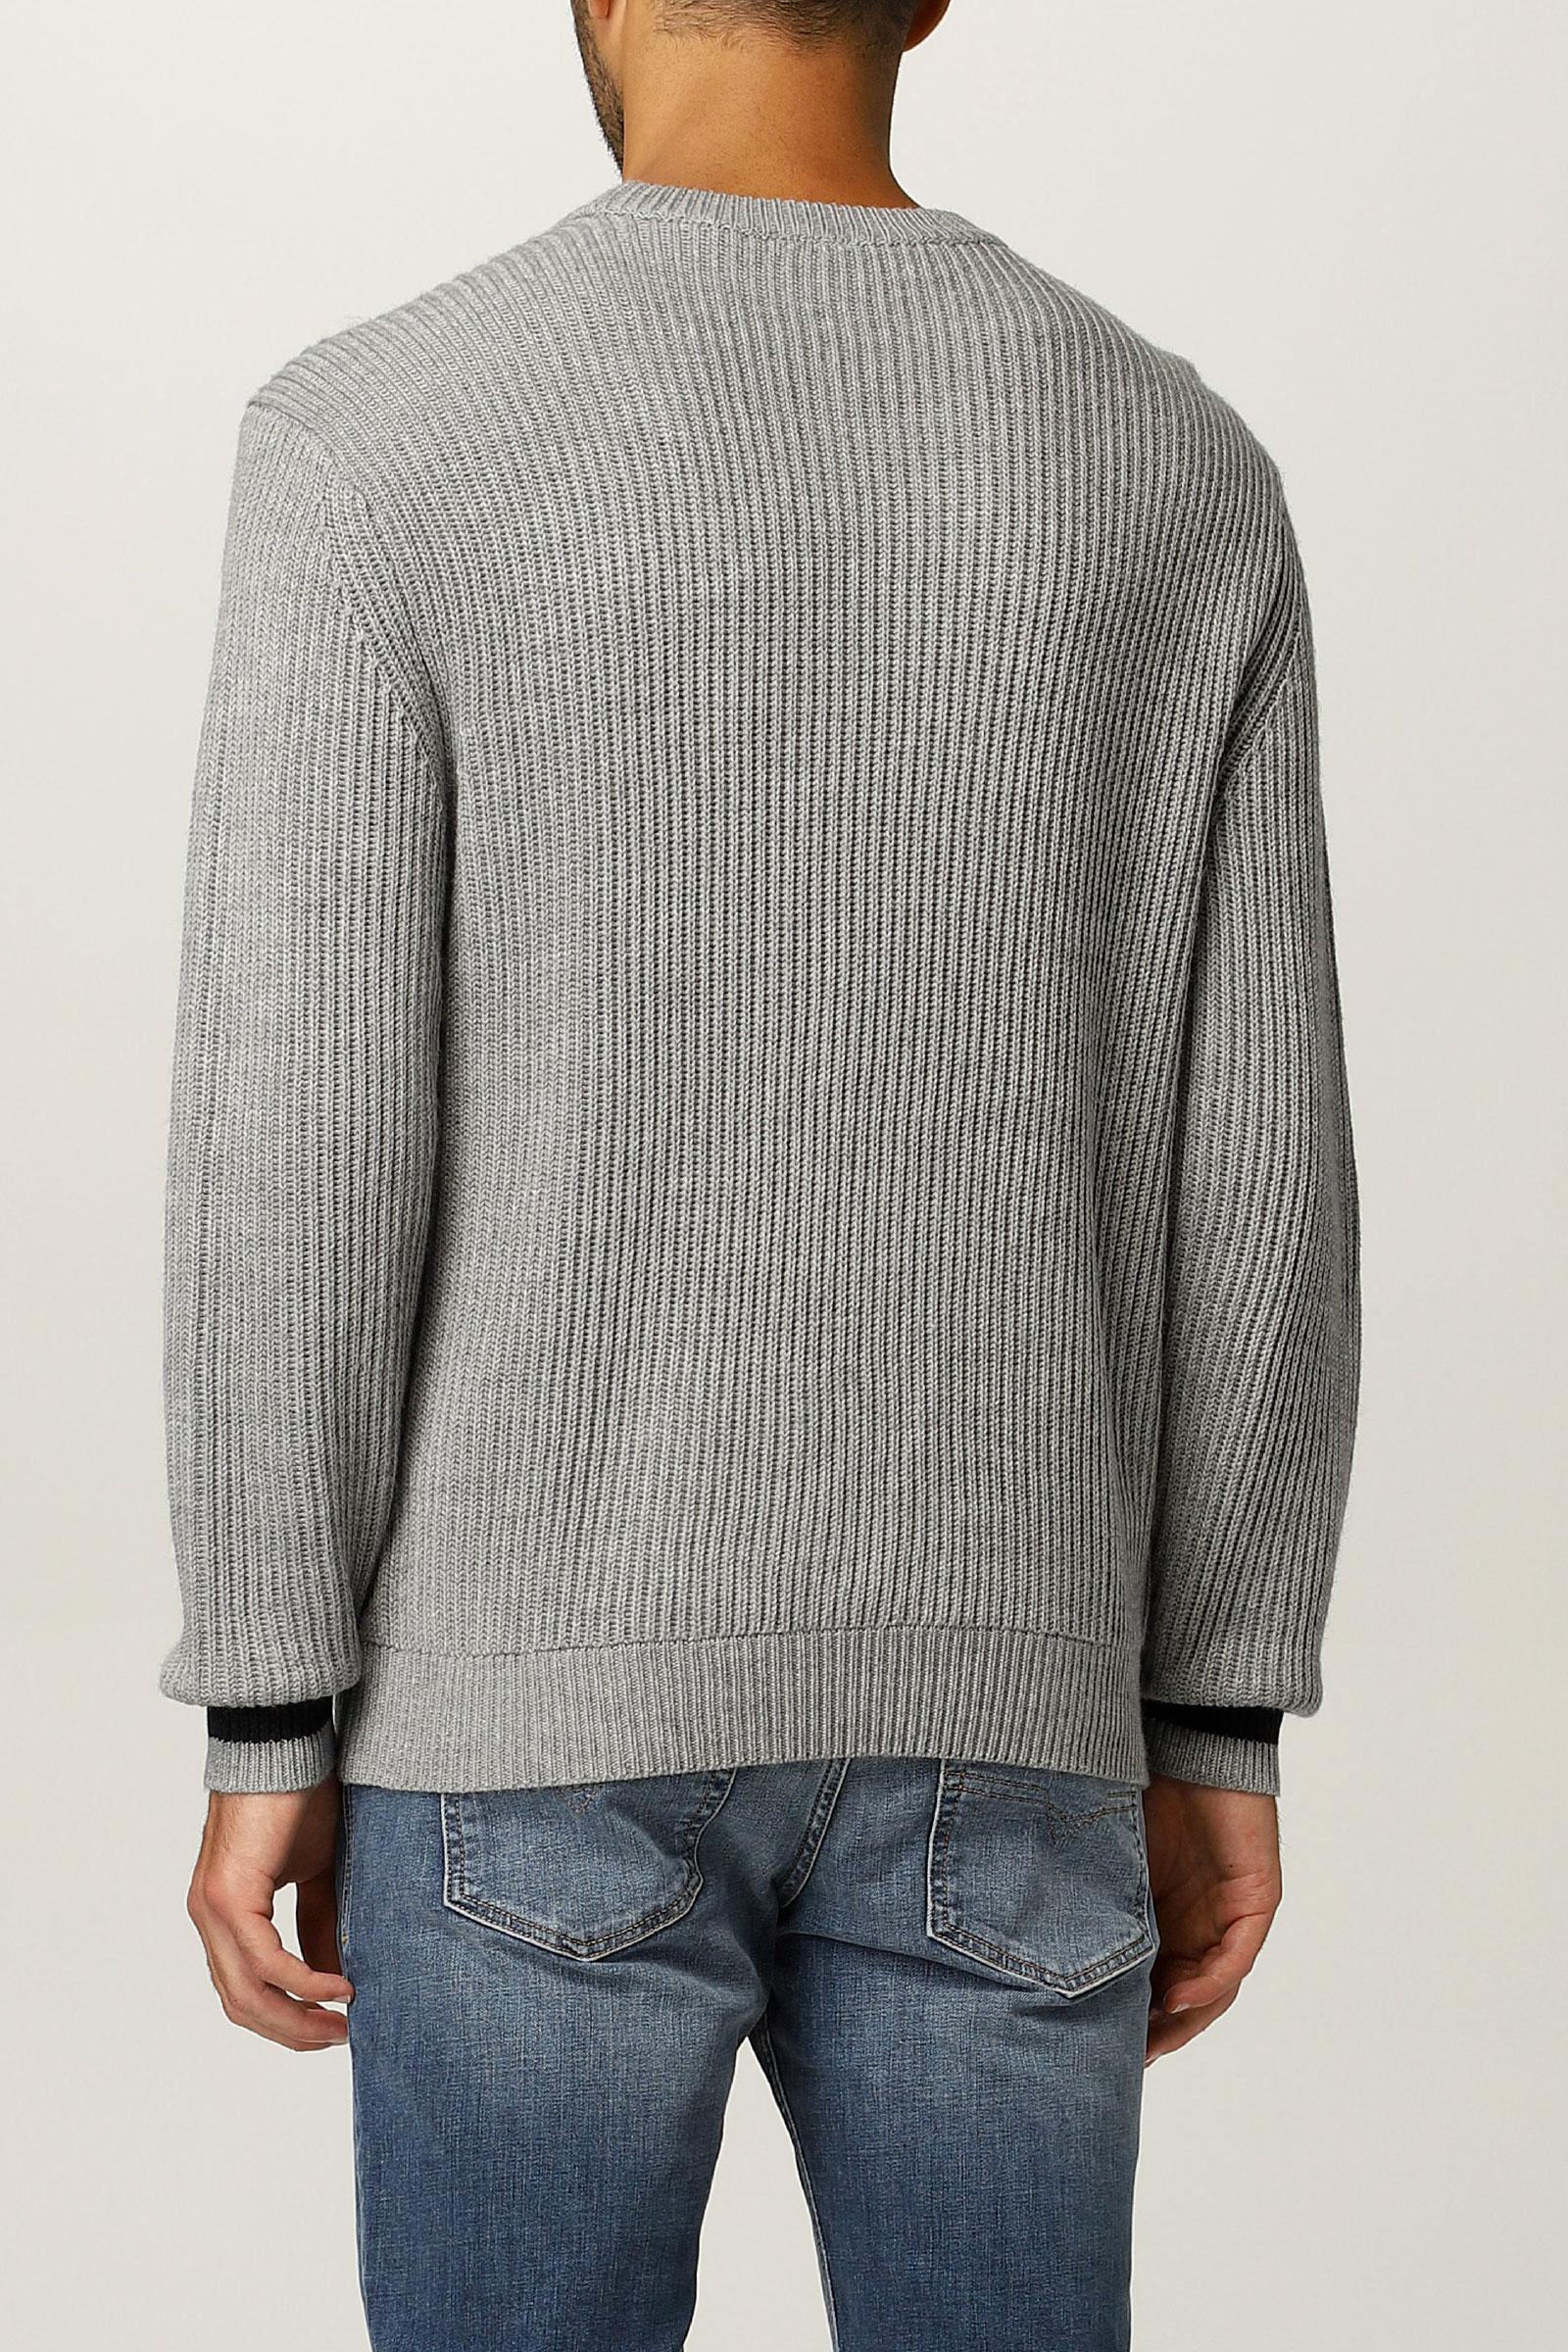 Pullover Uomo ARMANI EXCHANGE | Pullover | 6KZM2U ZM1GZ3907